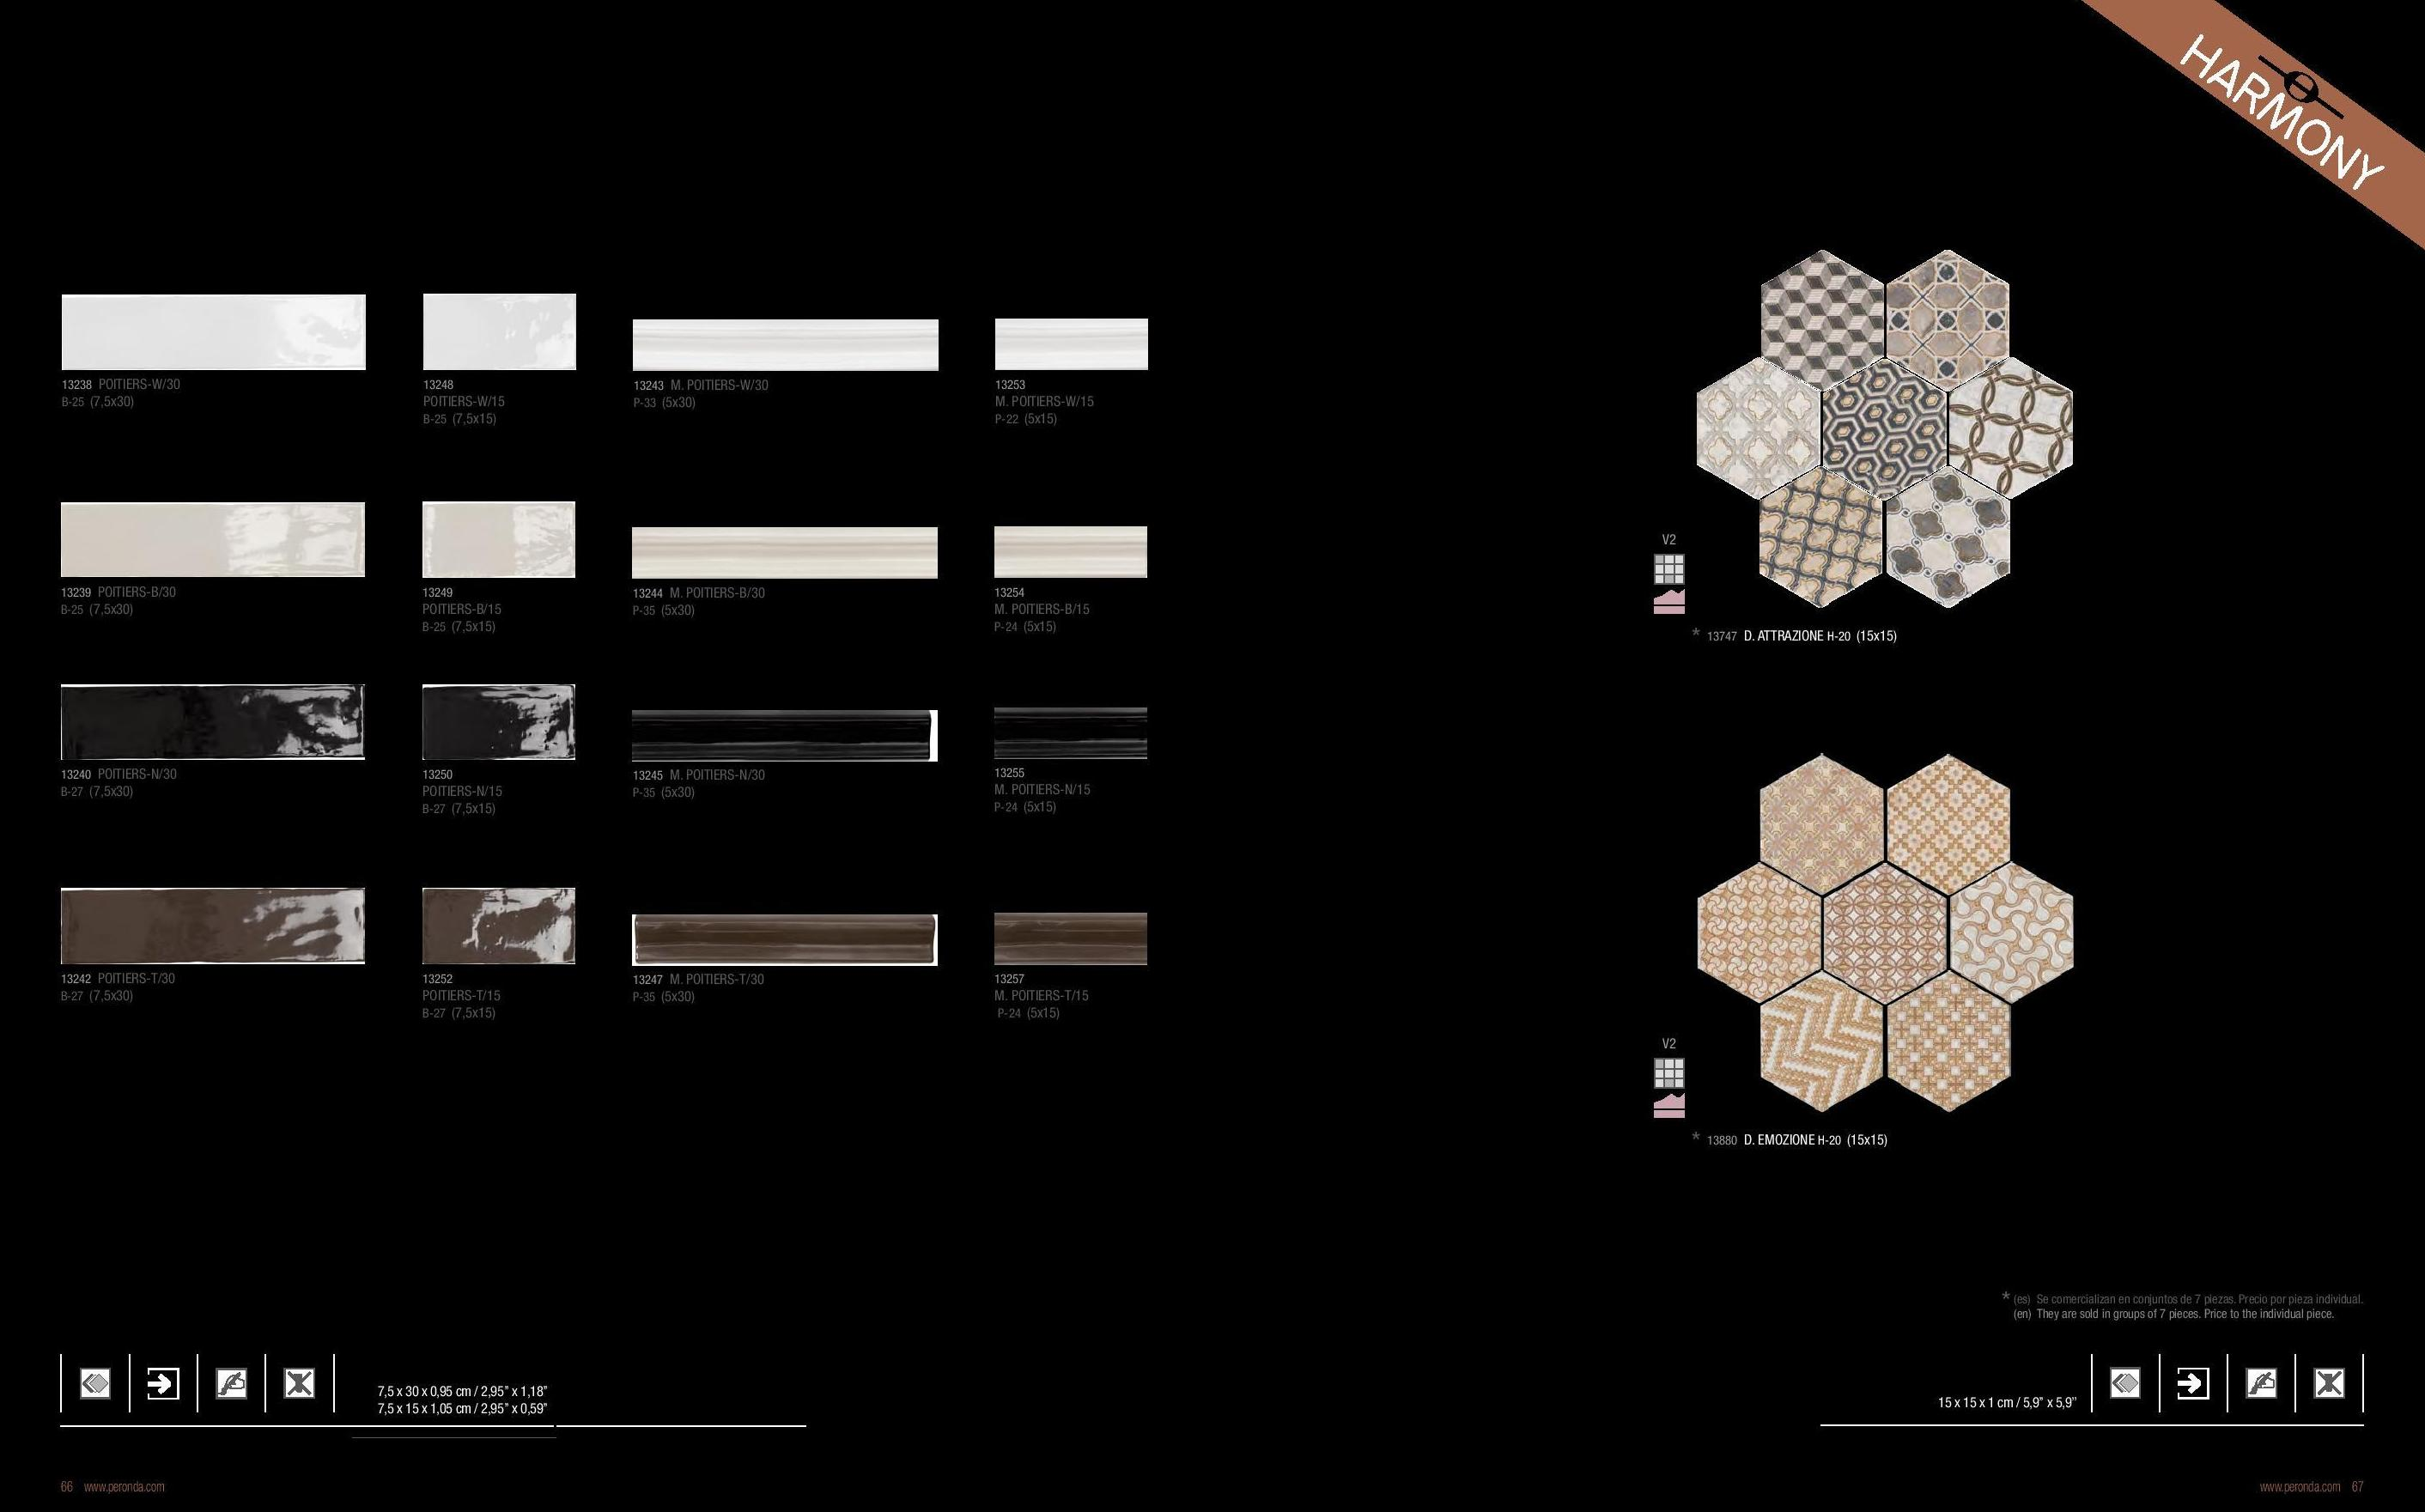 Diferentes tipos de mármol